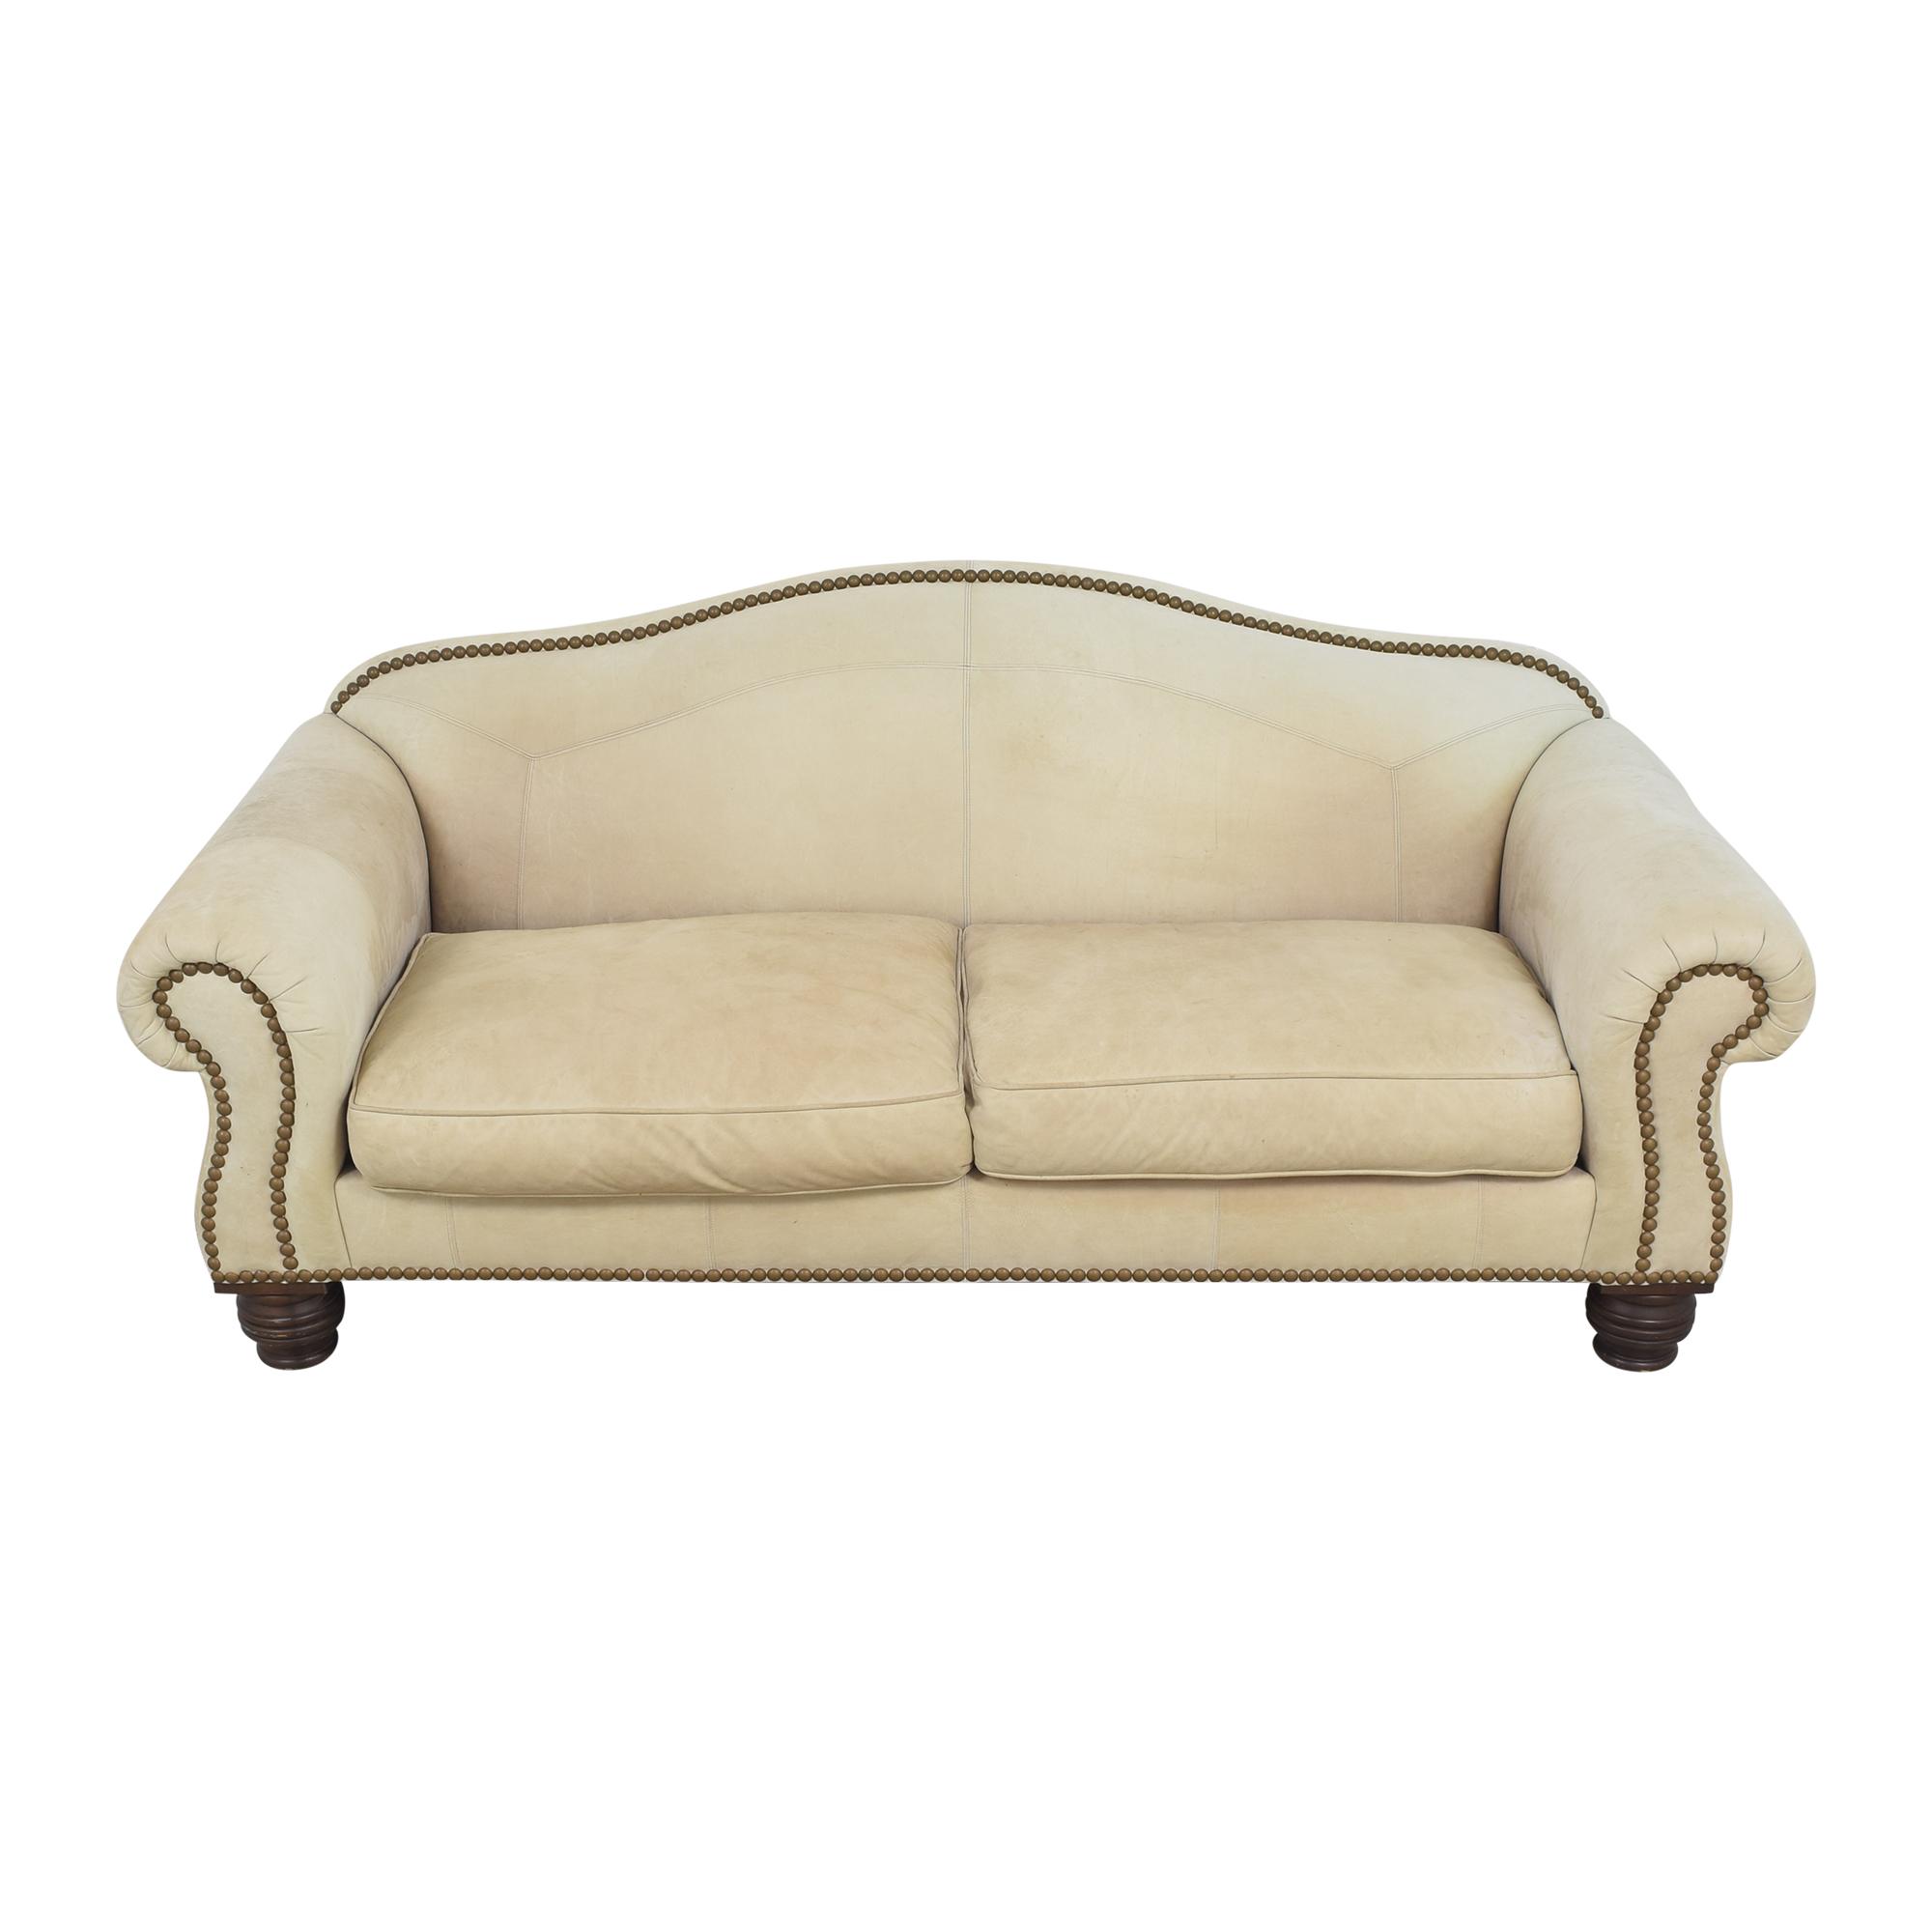 Lillian August Nailhead Camelback Sofa / Sofas